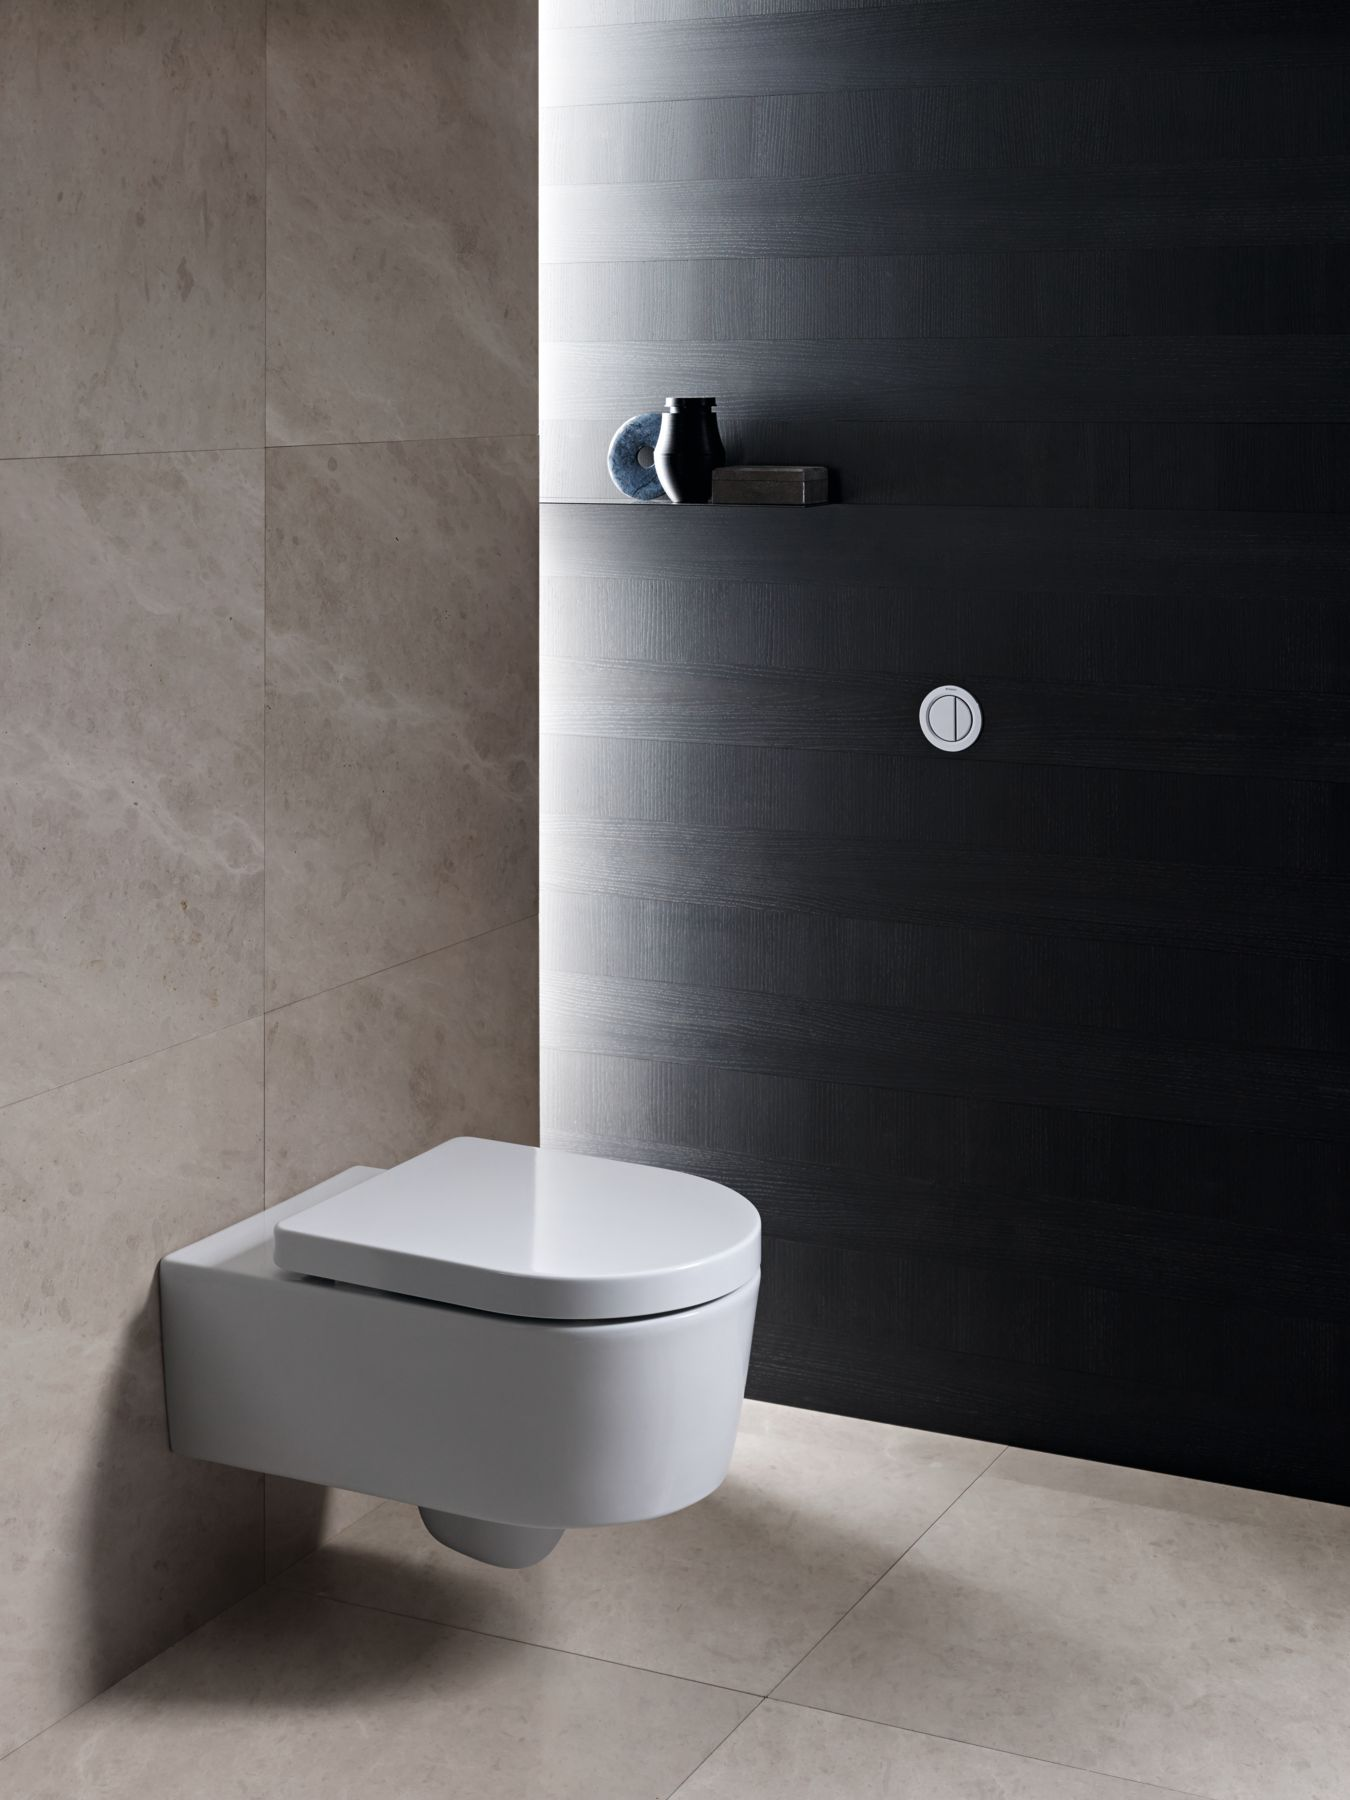 Toilet Spoelknop Met Bediening Op Afstand Nieuws